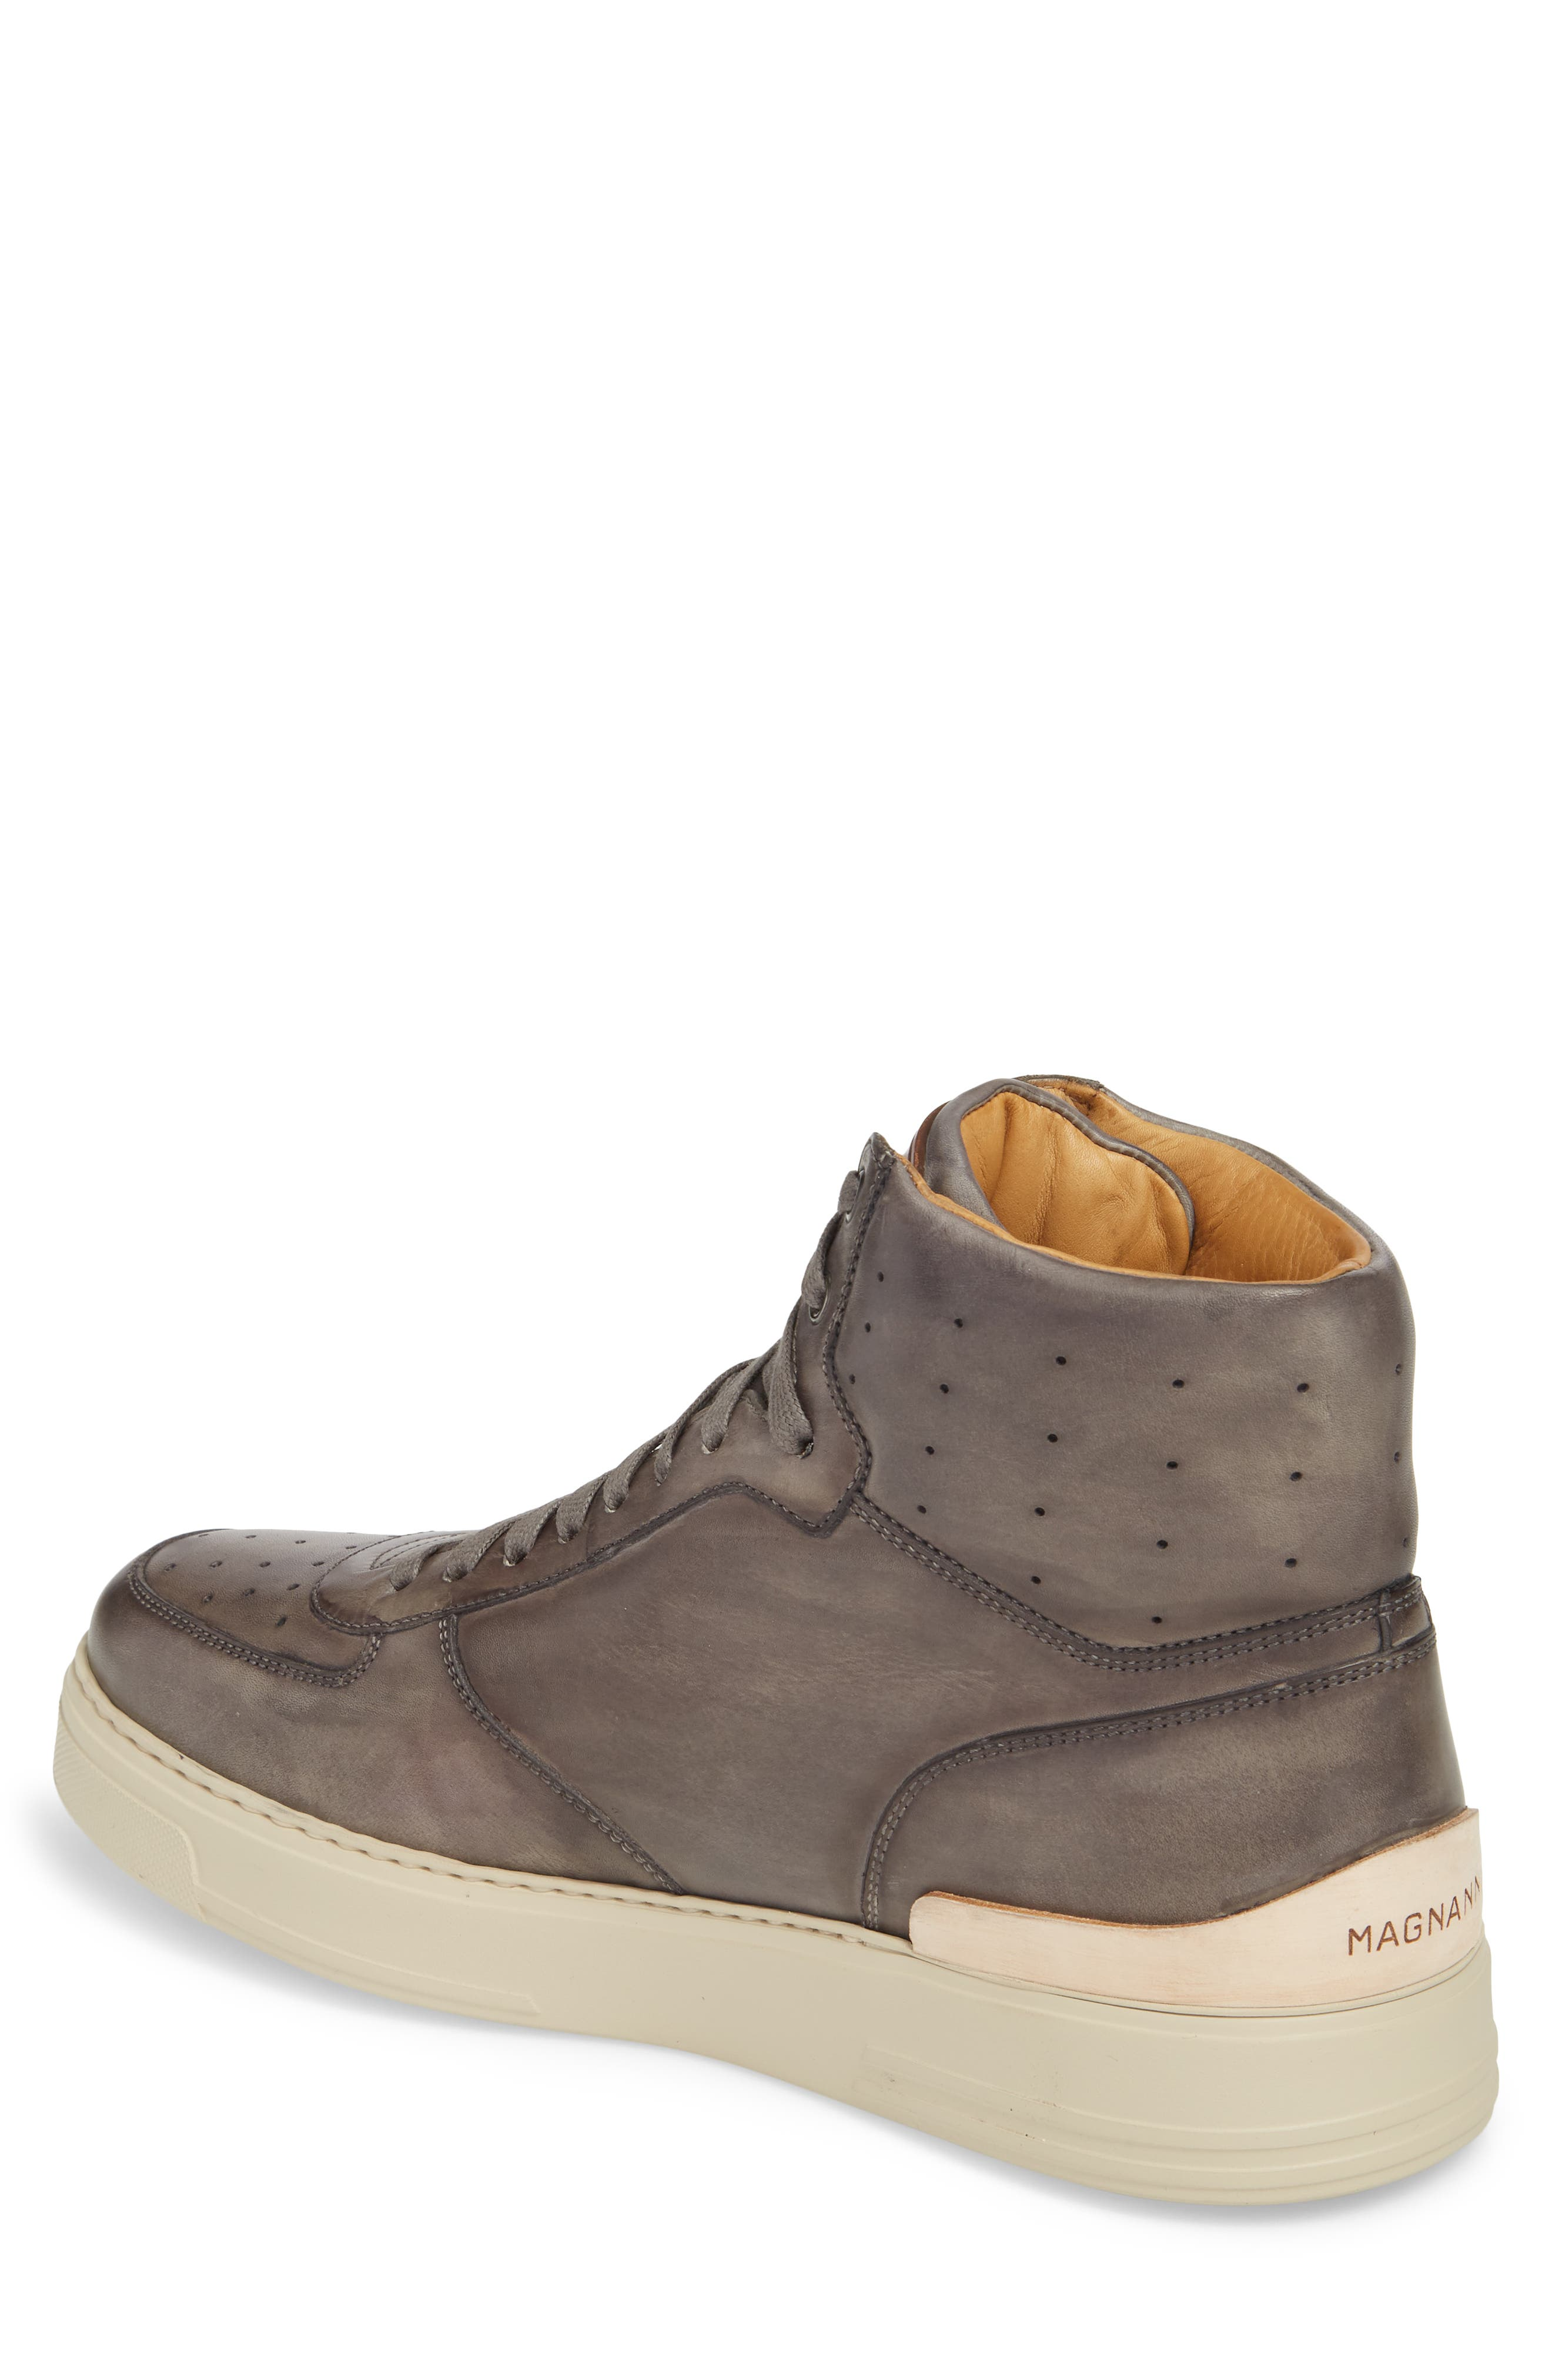 Varro Hi Top Lace Up Sneaker,                             Alternate thumbnail 2, color,